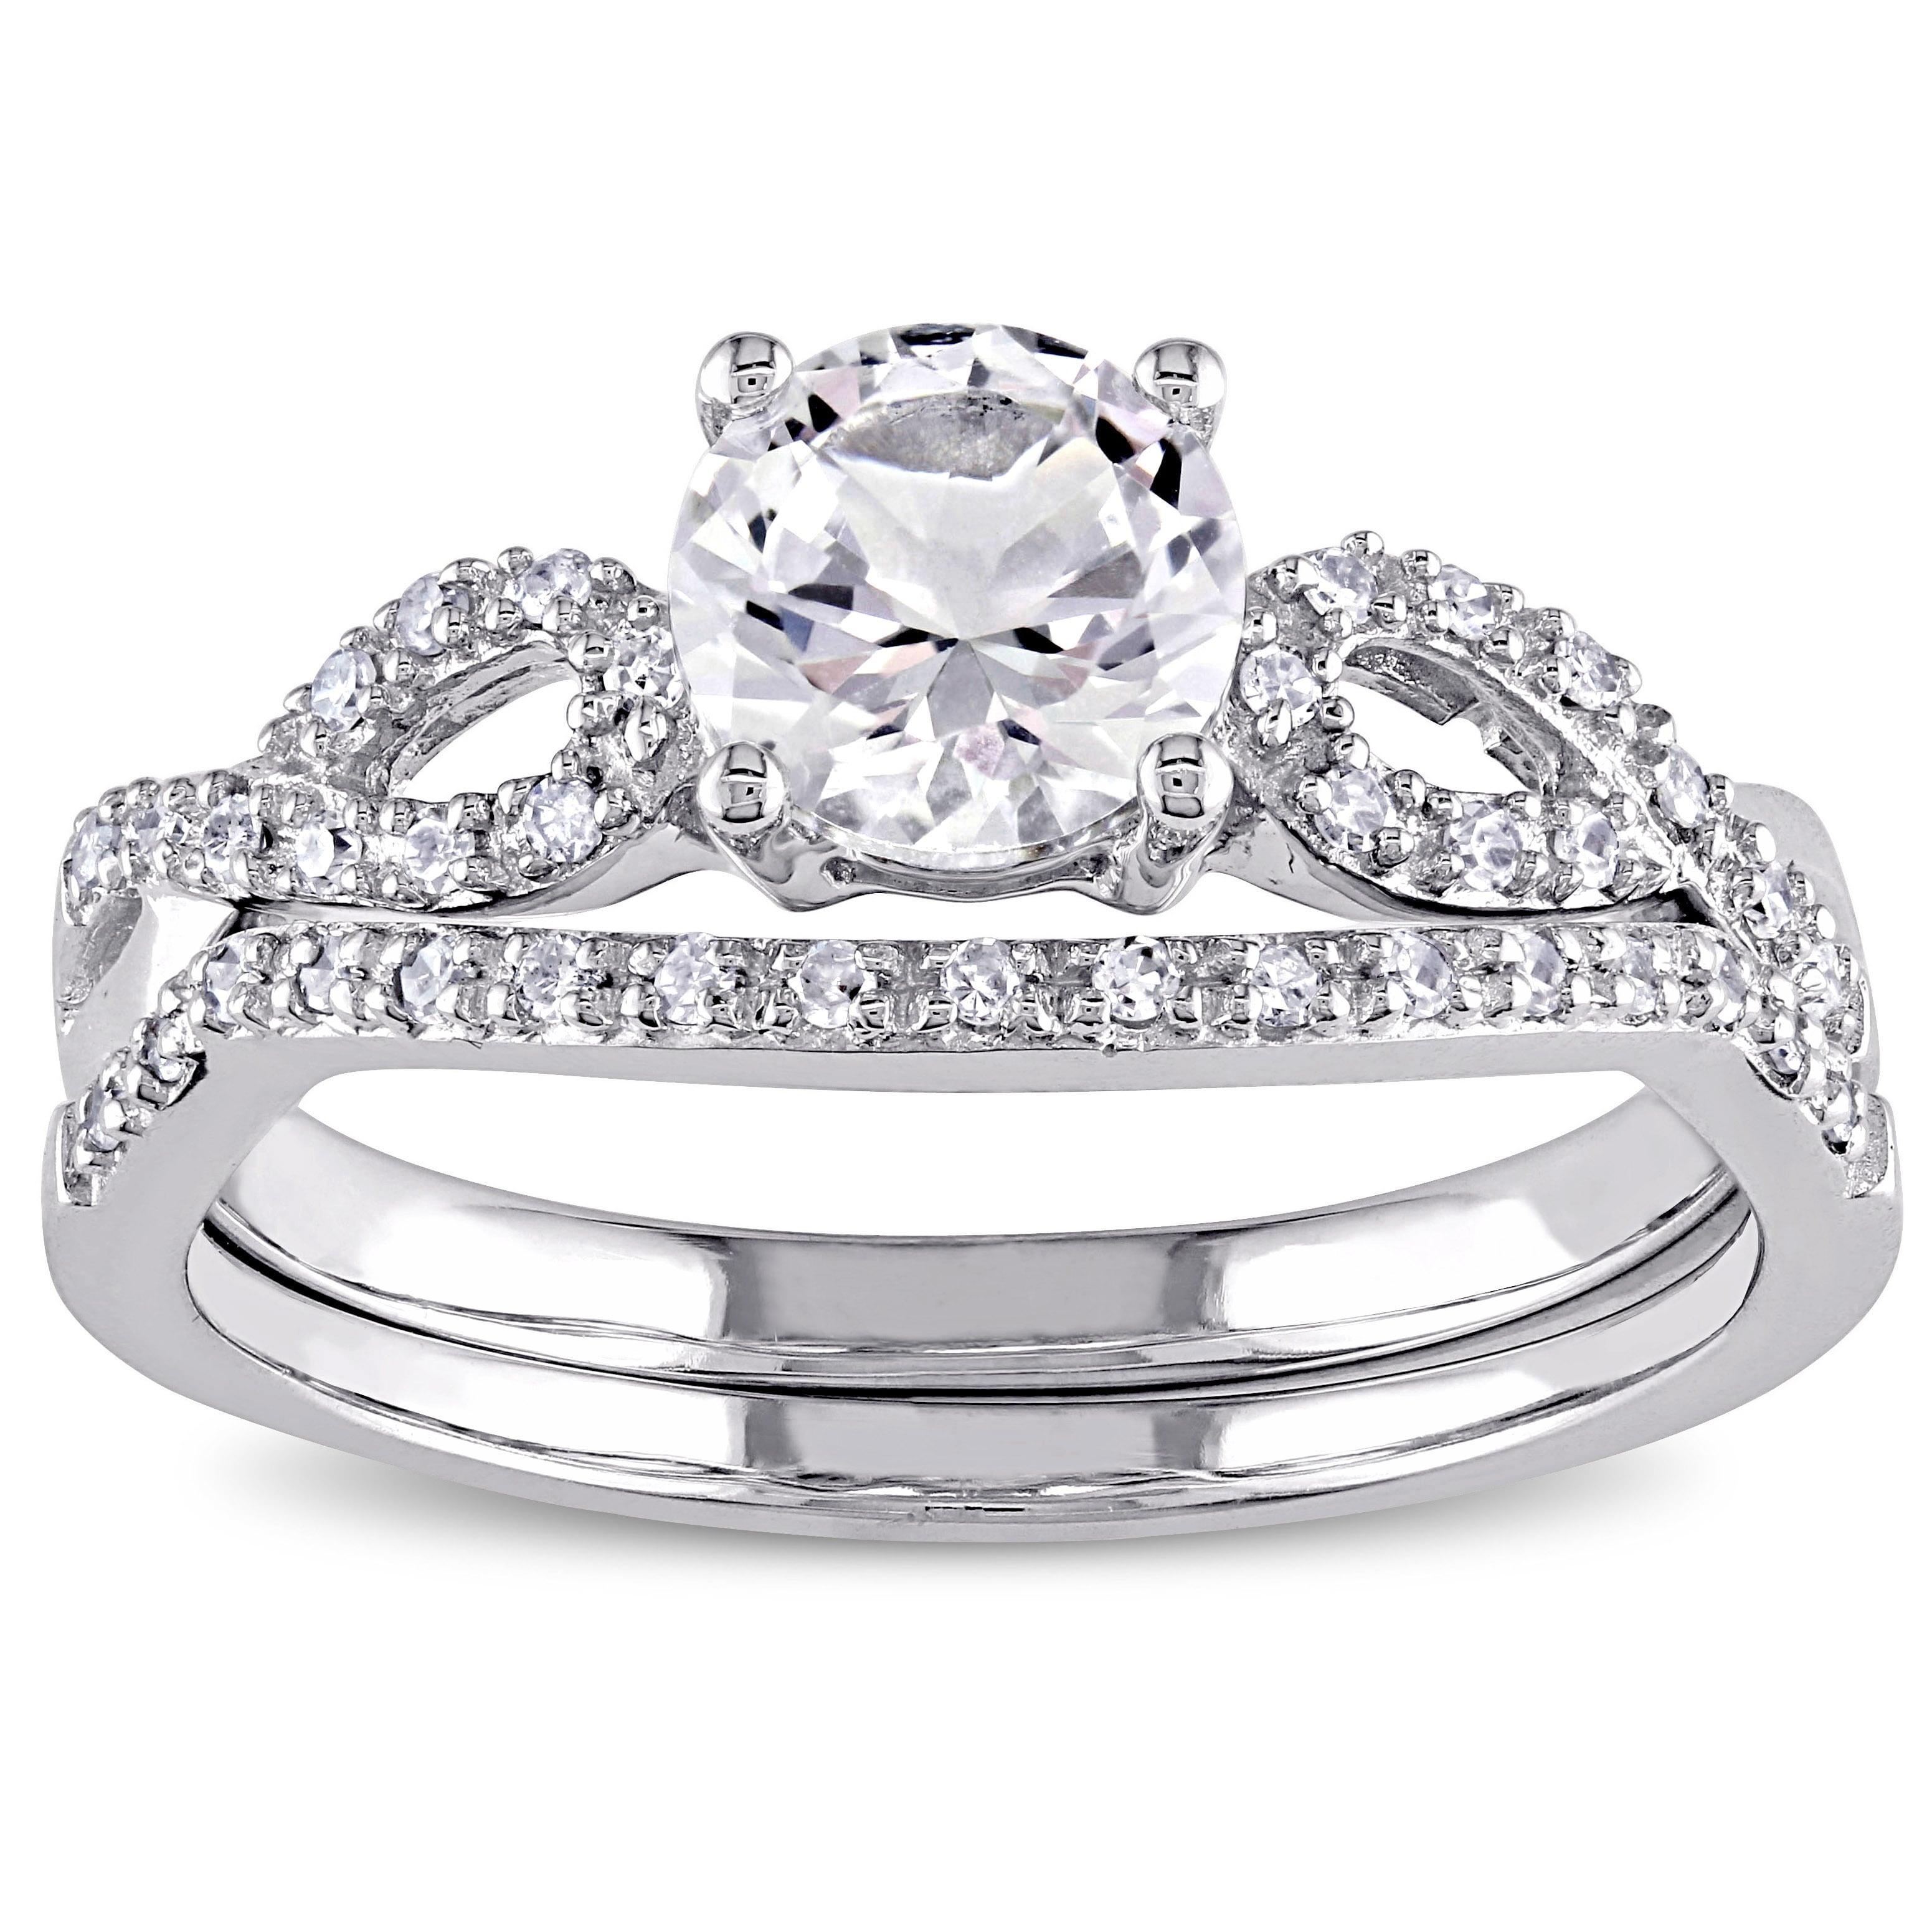 Miadora 10k White Gold Created White Sapphire and 1 6ct TDW Diamond Bridal Set by Overstock